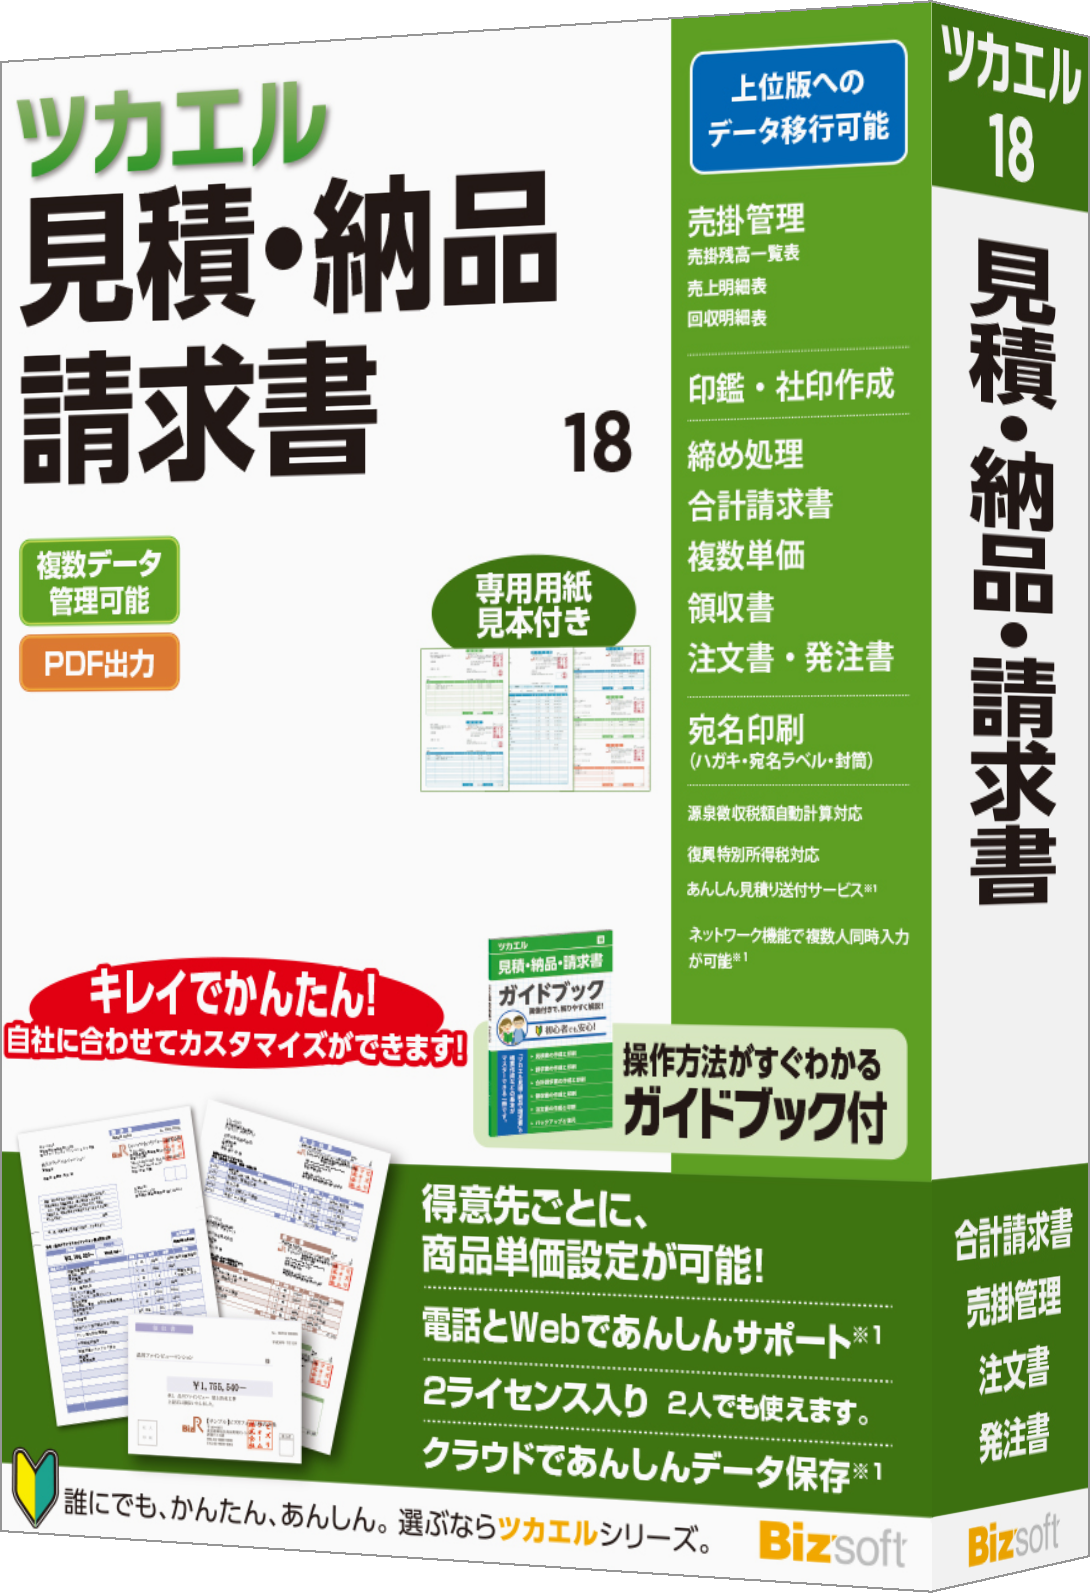 "「<a href=""https://www.bizsoft.co.jp/products/estimate/index.html"">ツカエル見積・納品・請求書 18</a>」パッケージ"